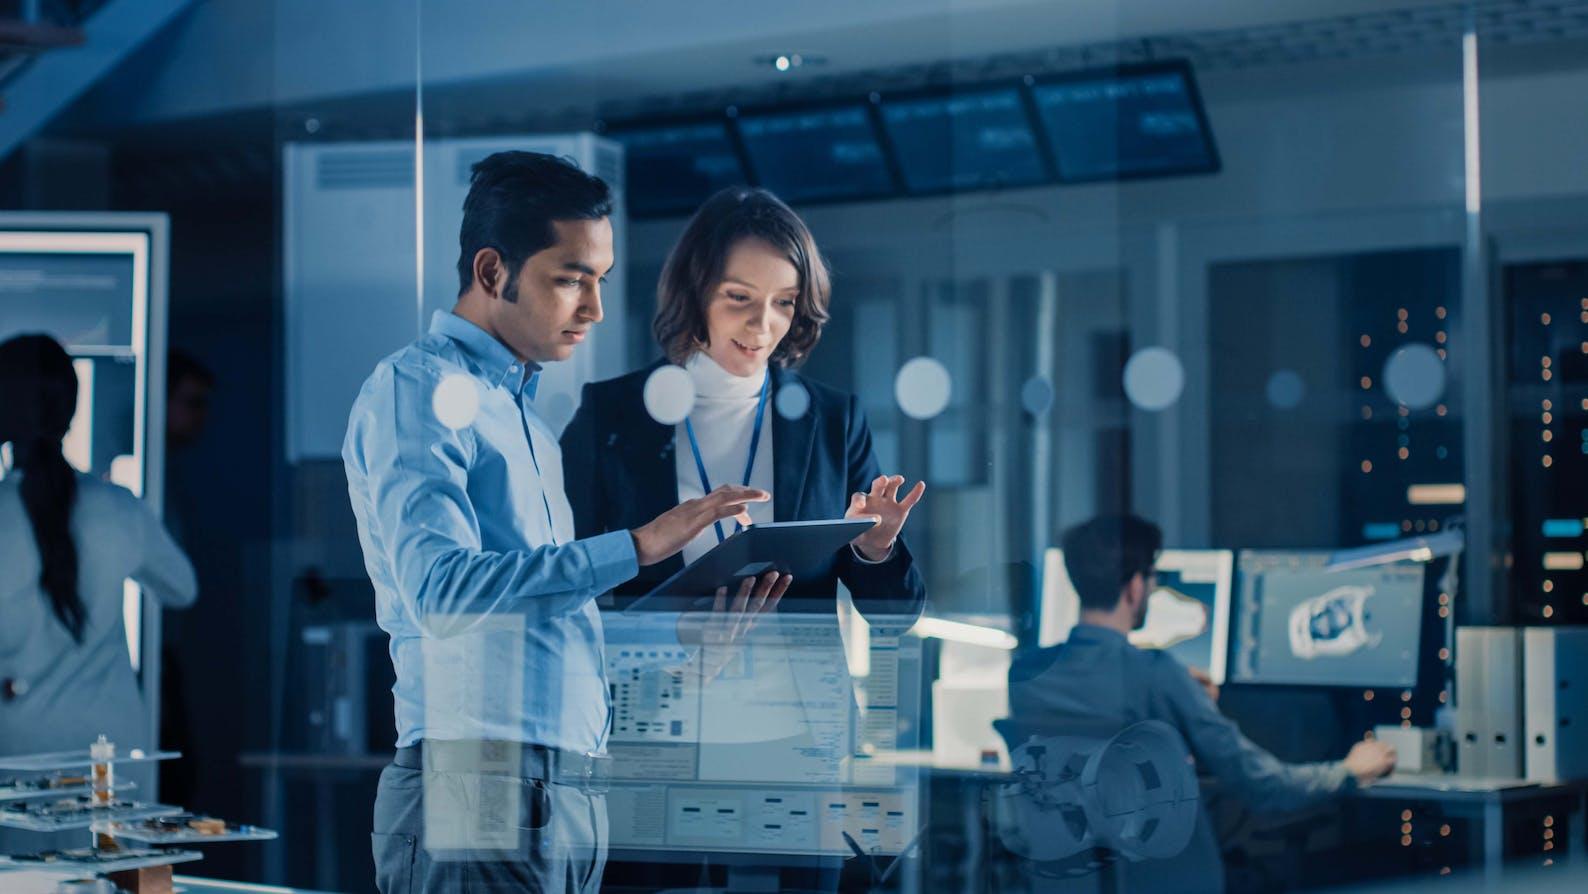 Tech accelerators in Alberta and Calgary